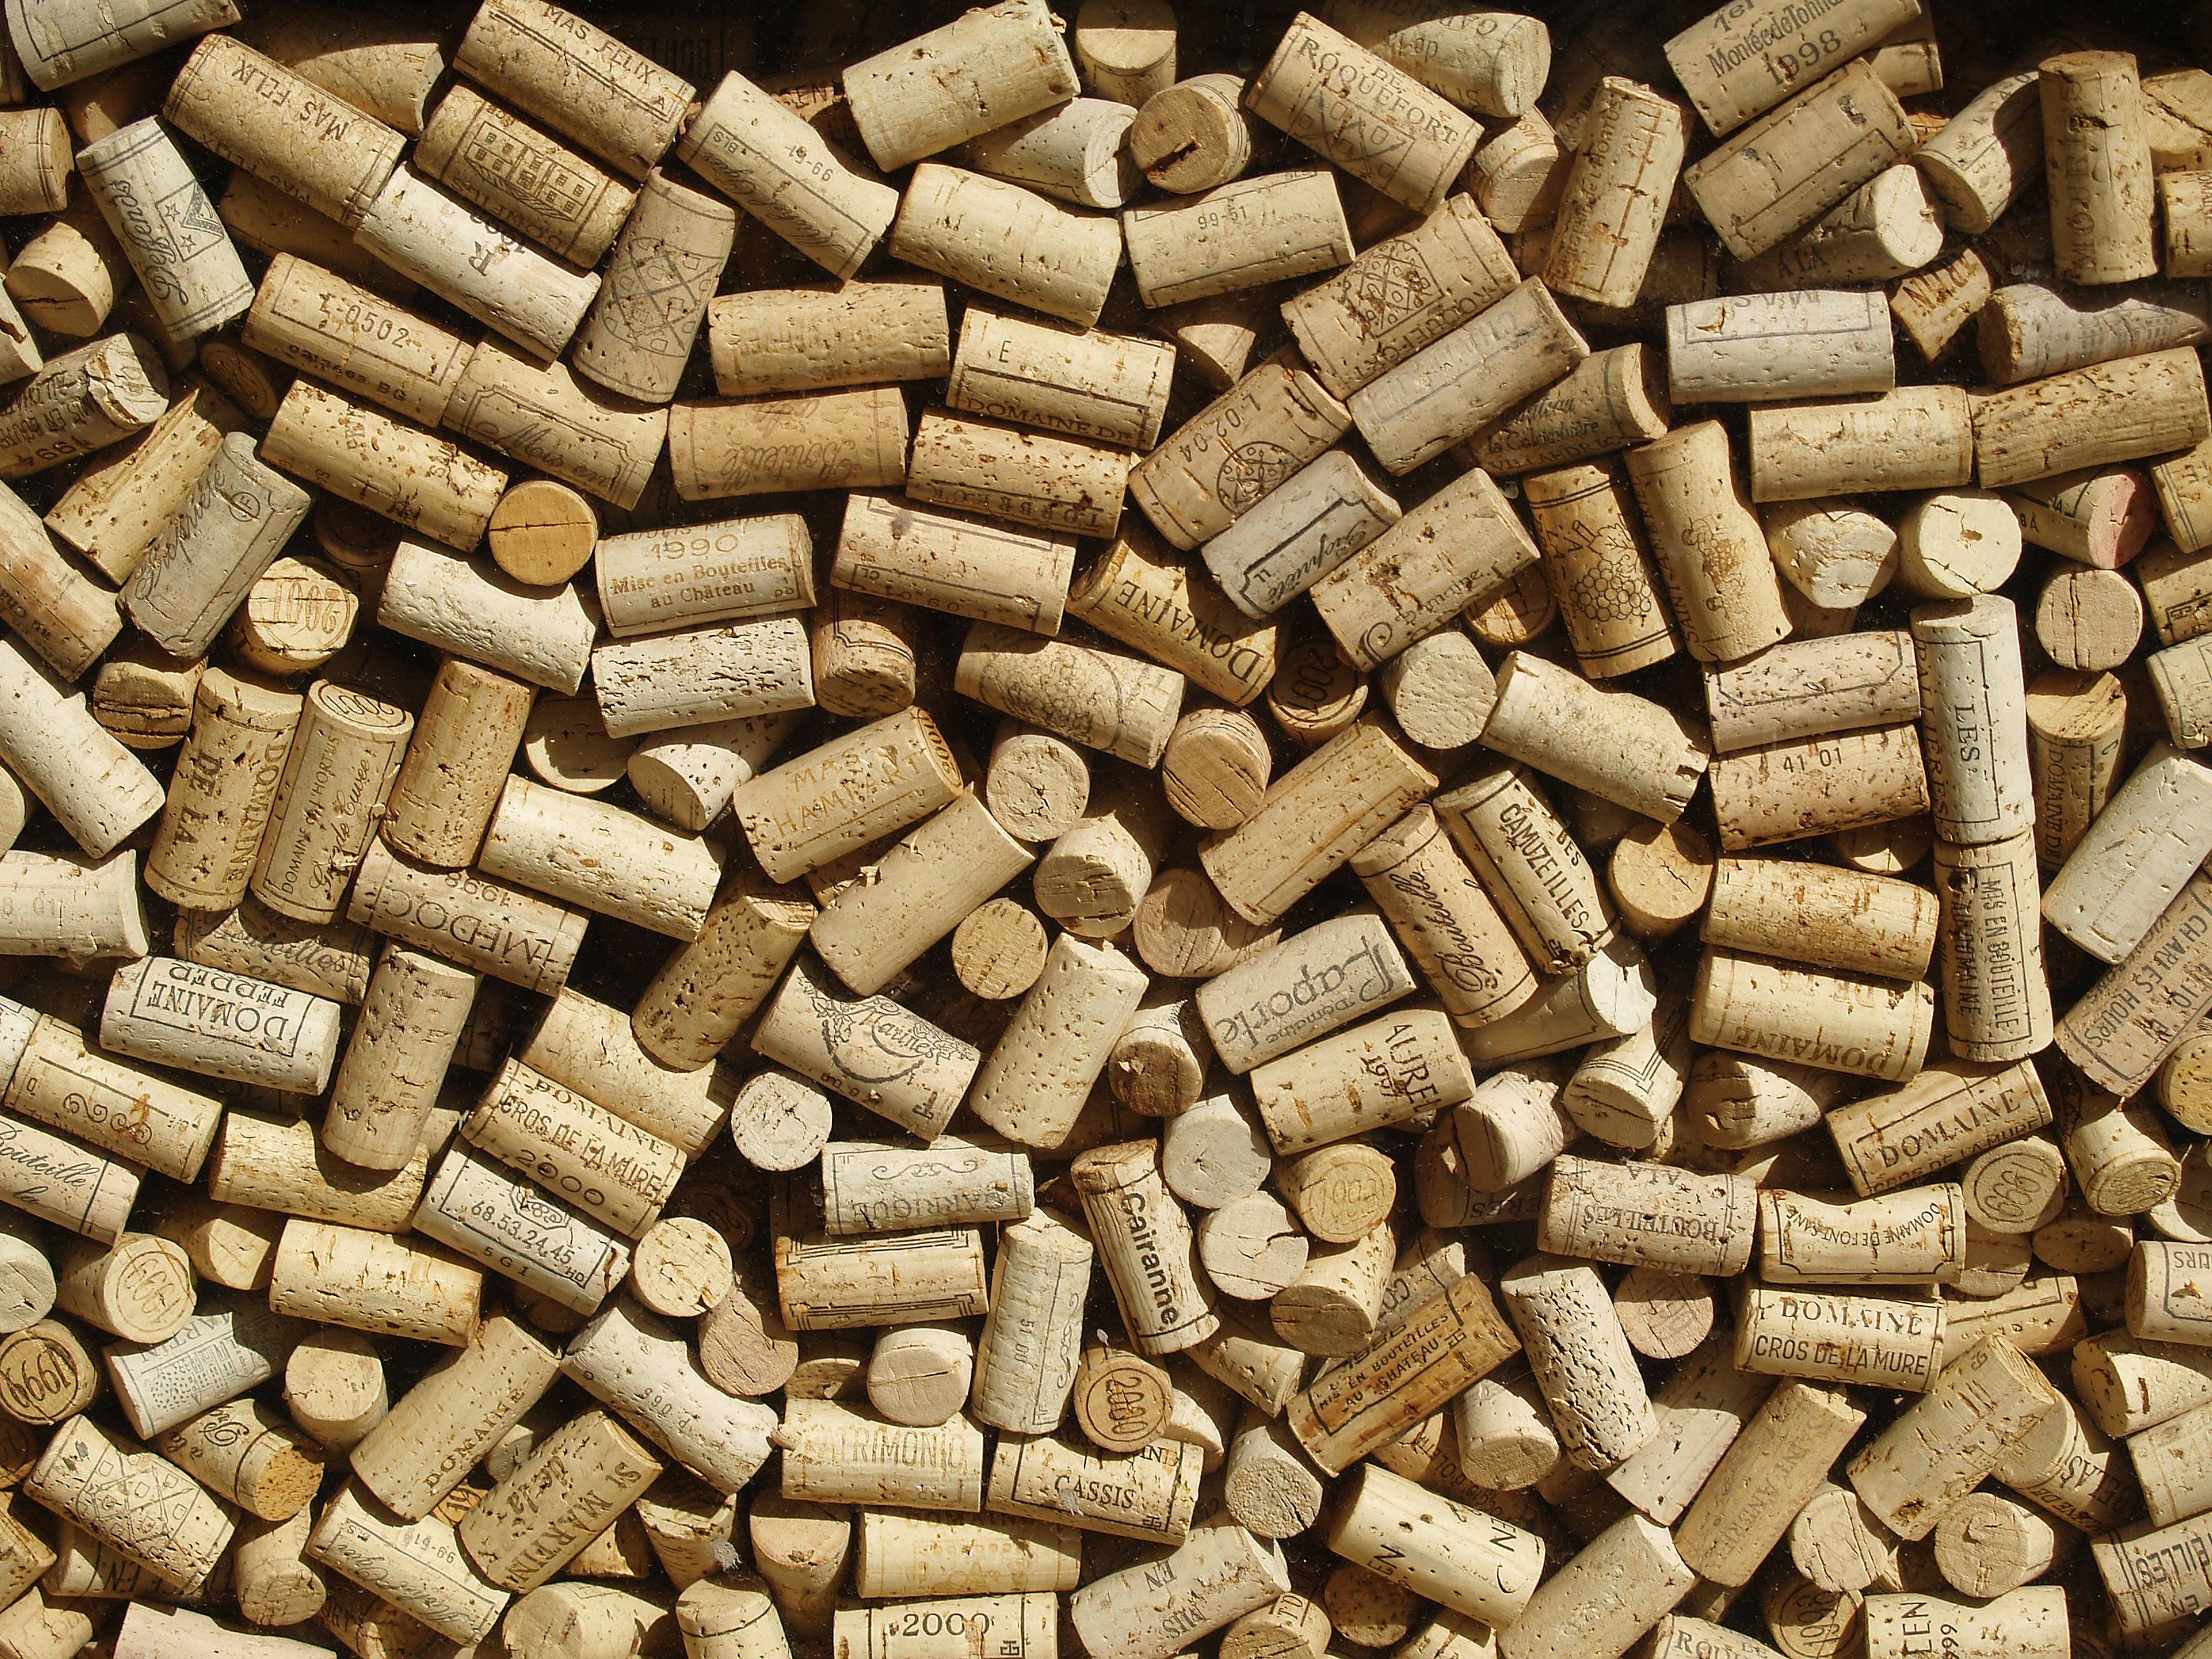 File:Wine bottle corks behind glass.jpg